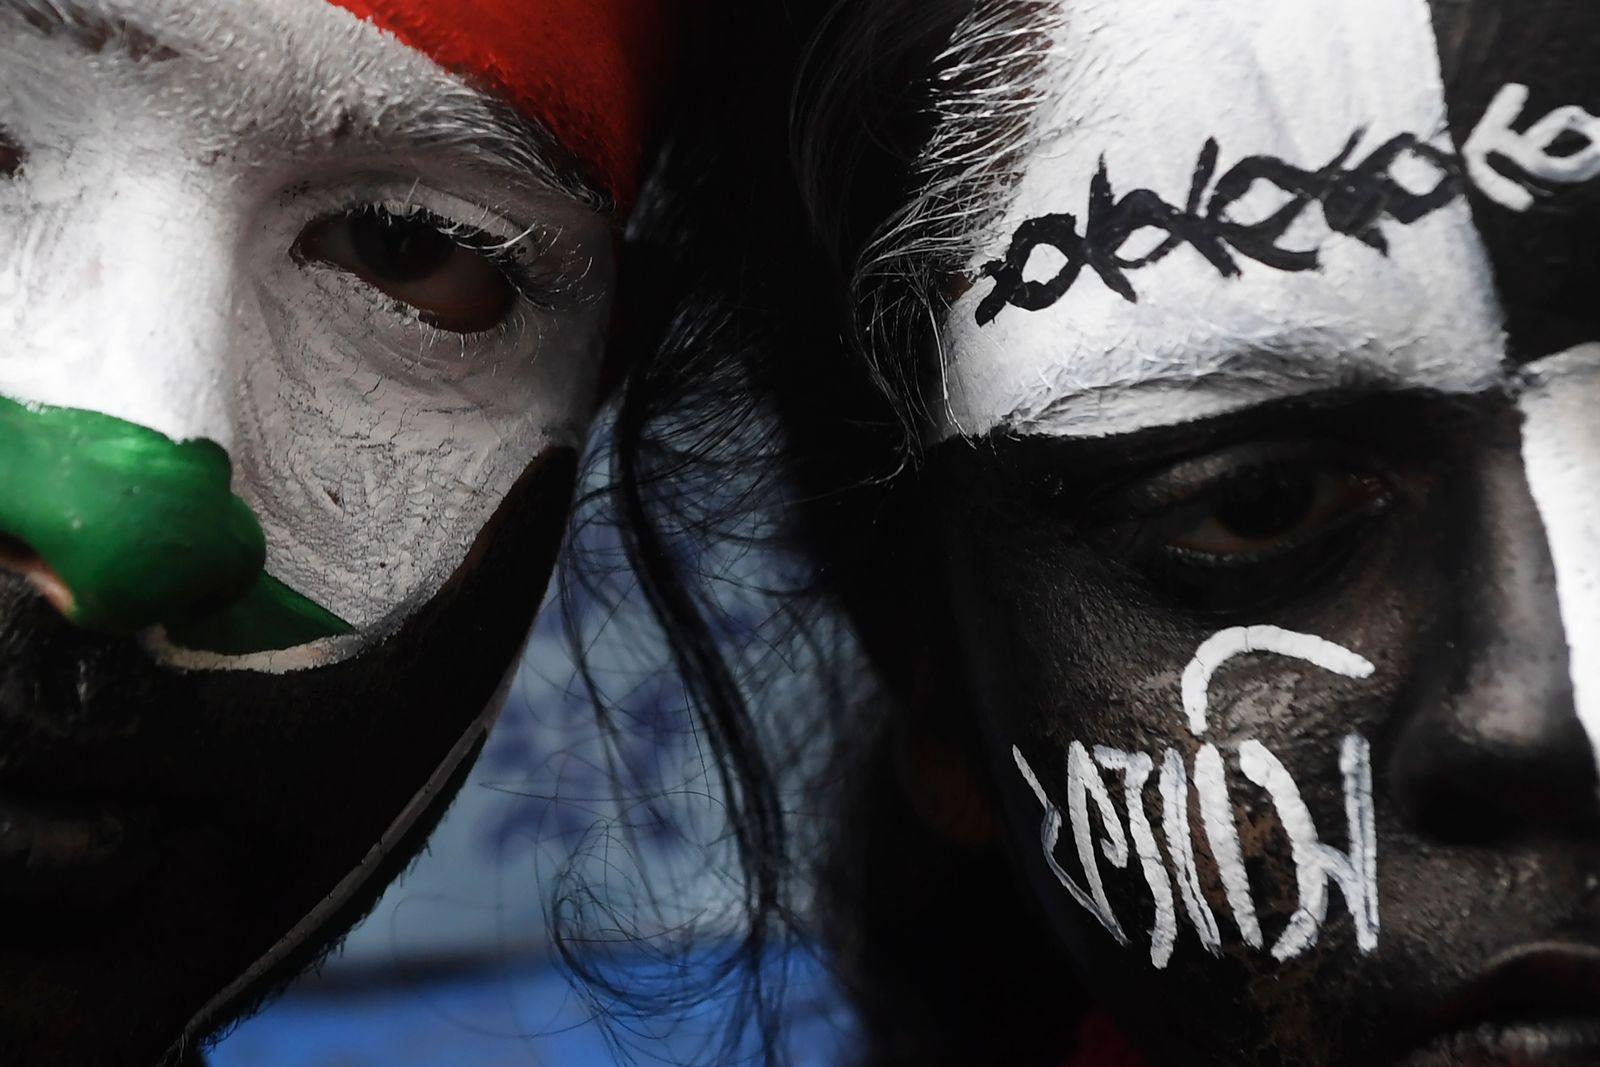 TOPSHOT-INDIA-POLITICS-RIGHTS-PROTEST